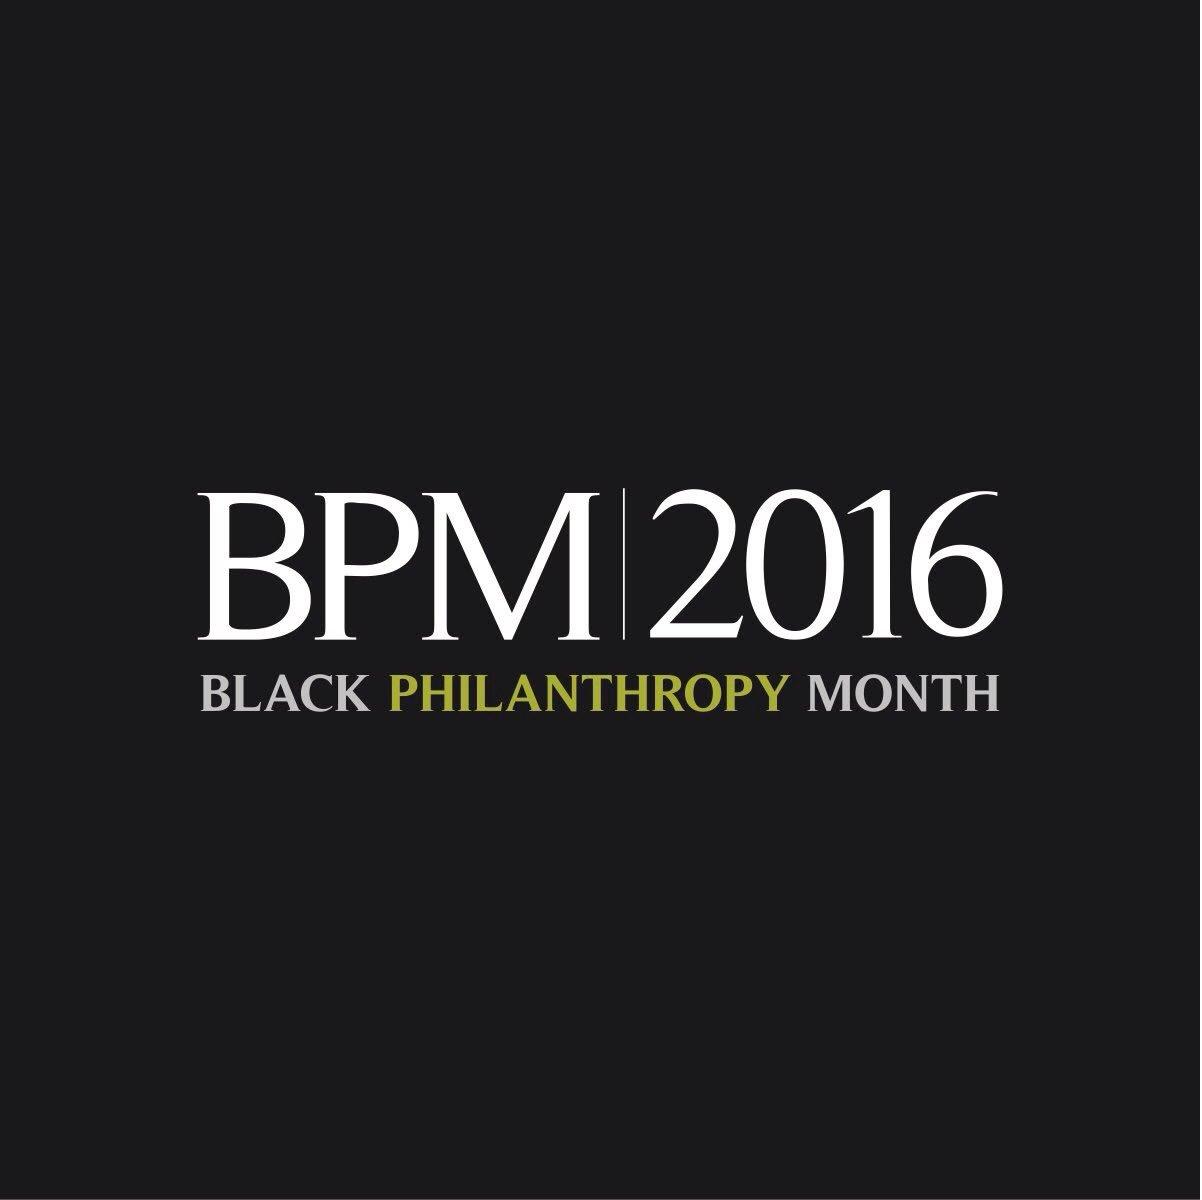 Happy Black Philanthropy Month! #BPM2016 #CHAGives https://t.co/jQ5PohdYNX